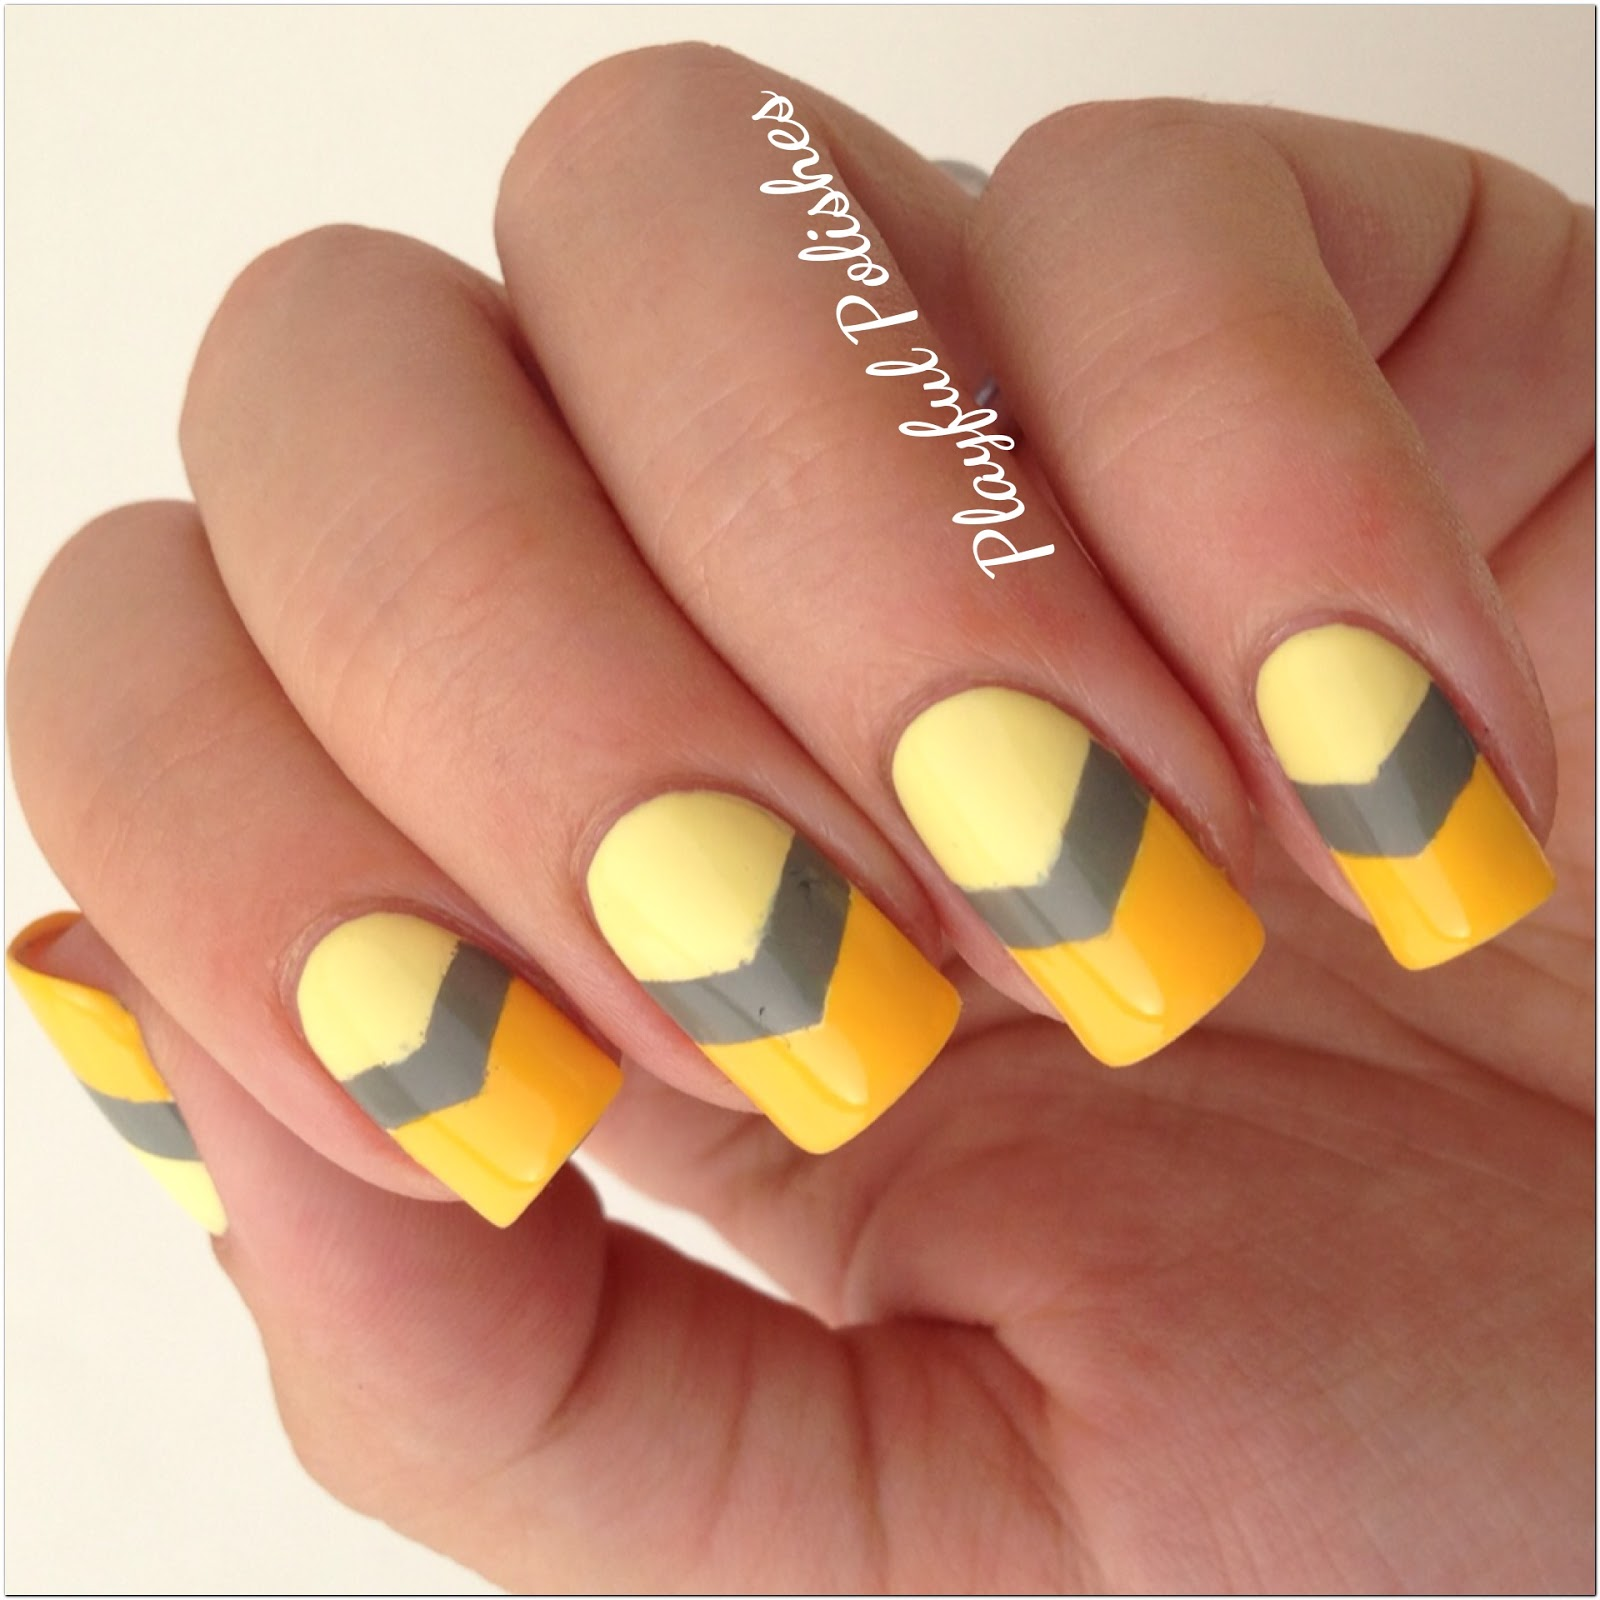 Orange Toe Nail Design | Nails Ideas